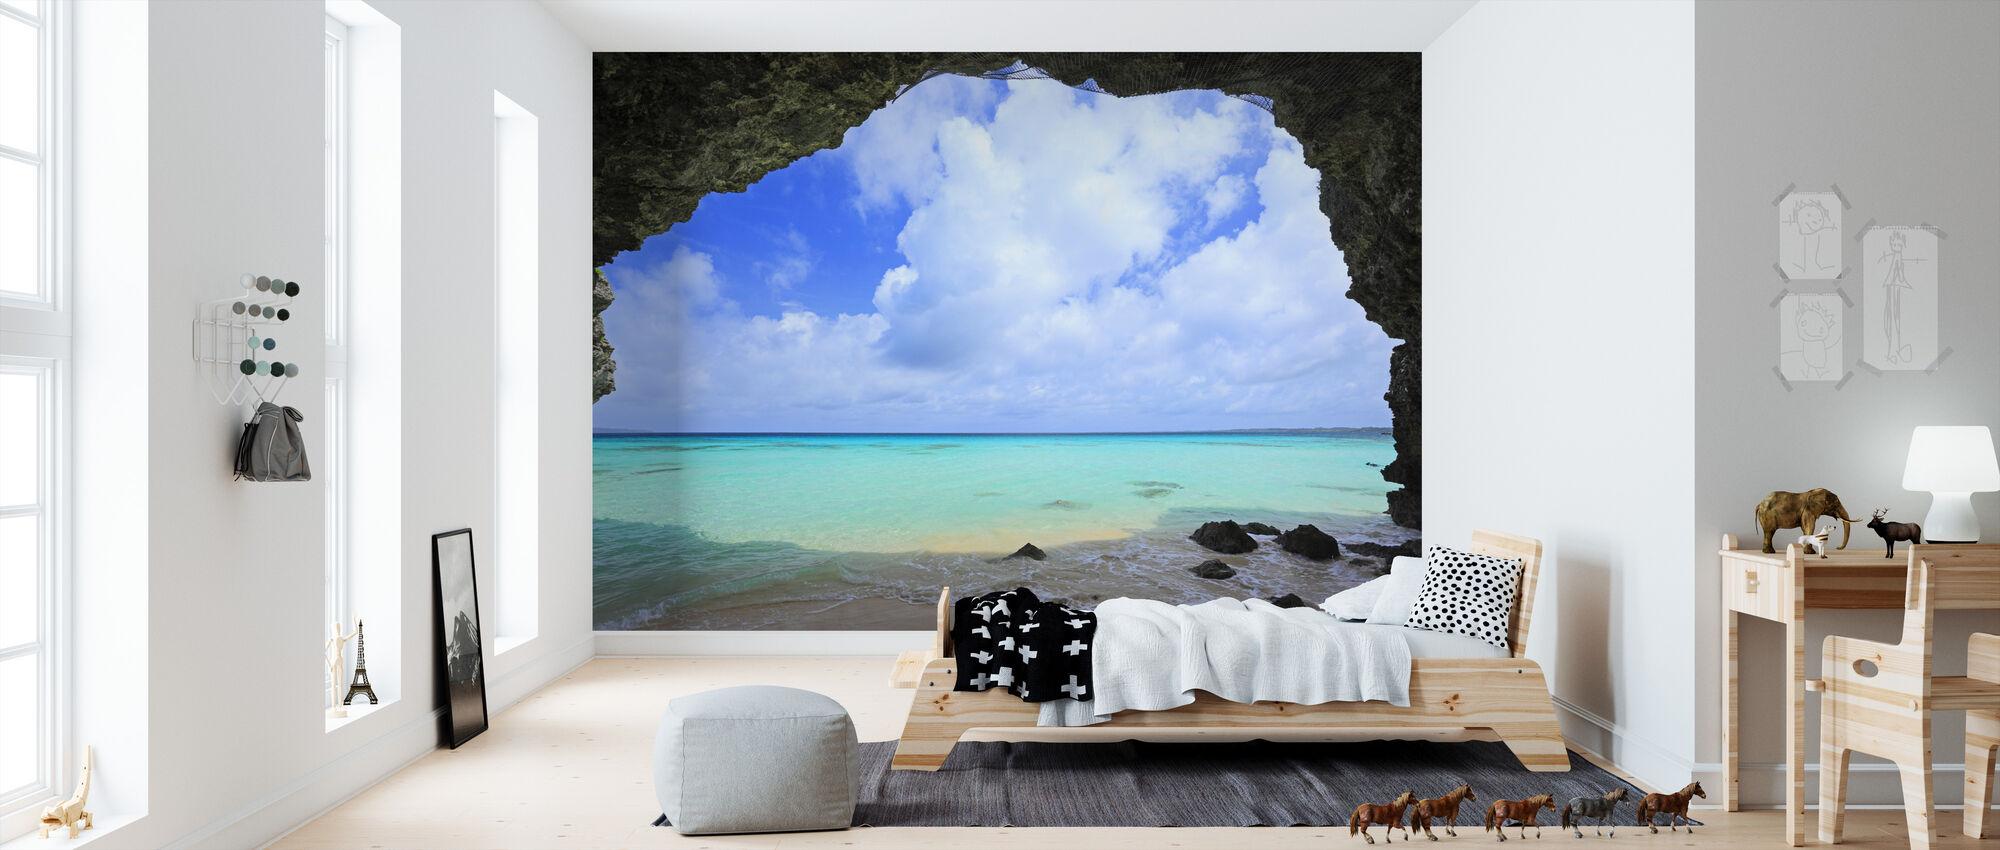 crystal clear fototapete nach ma photowall. Black Bedroom Furniture Sets. Home Design Ideas